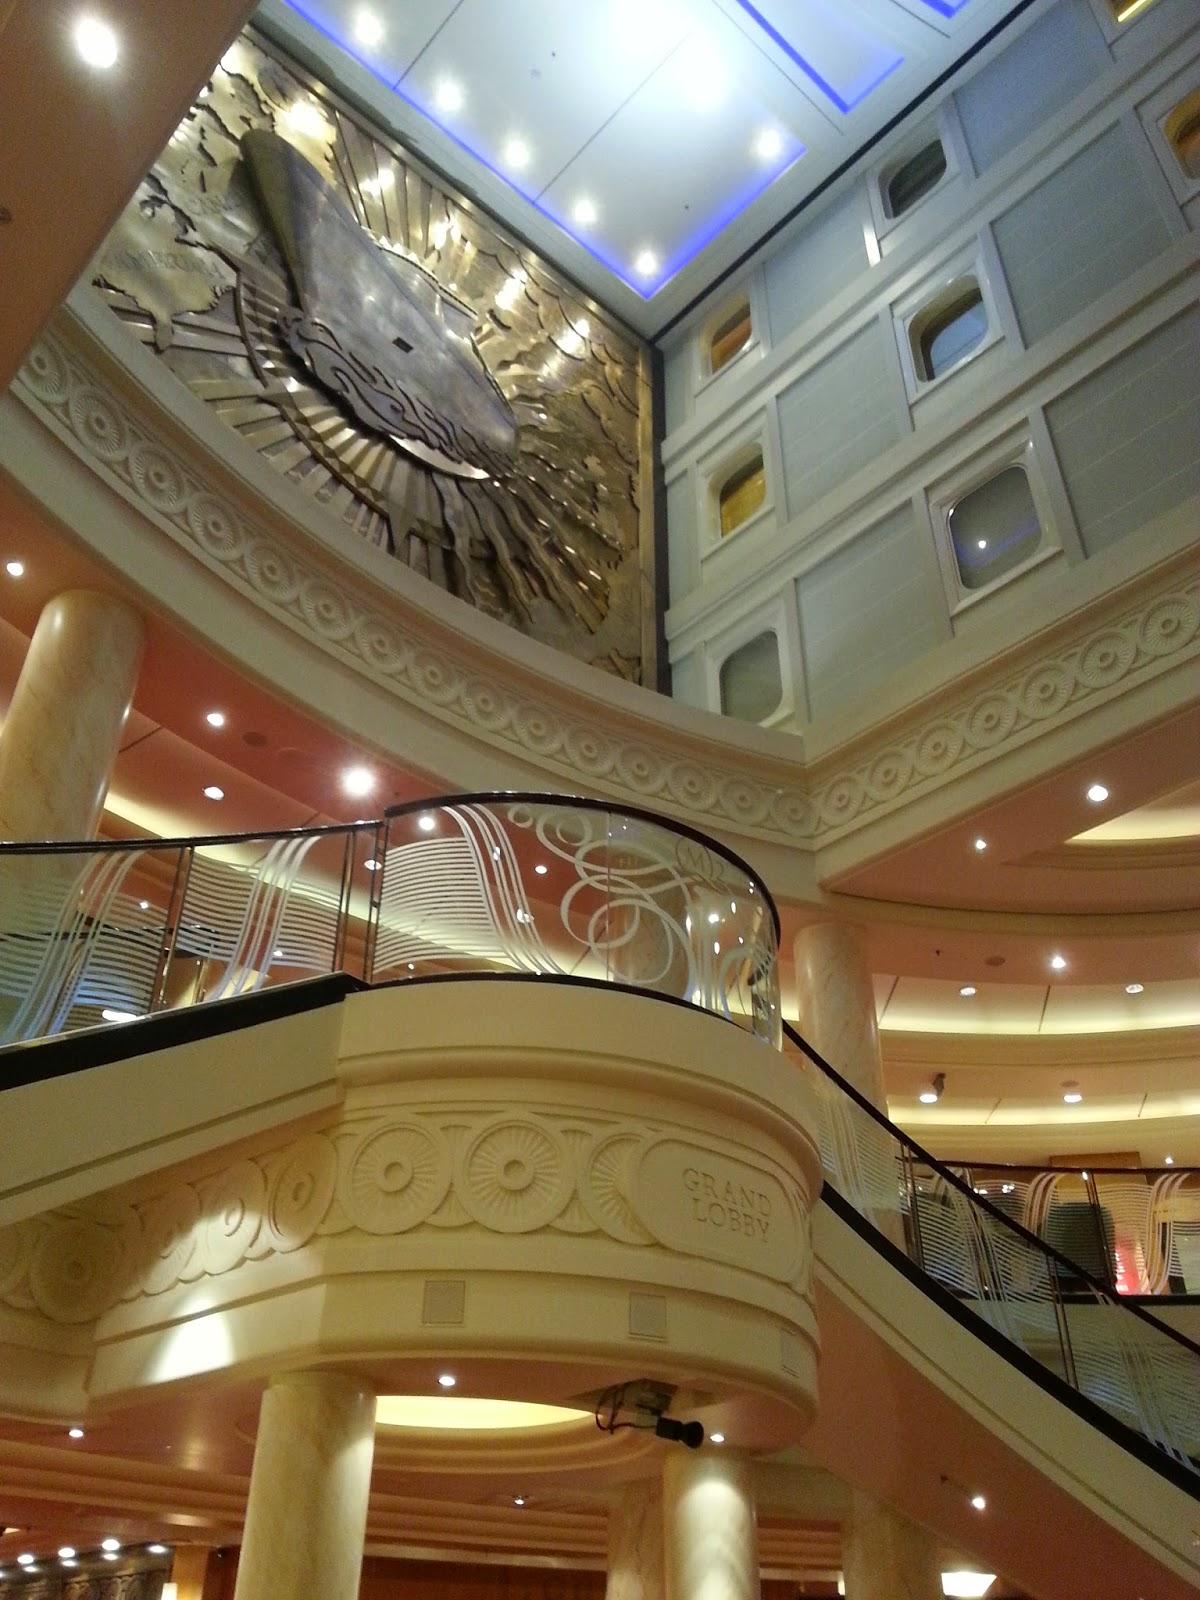 Queen Mary 2 (QM2) - Grand Lobby